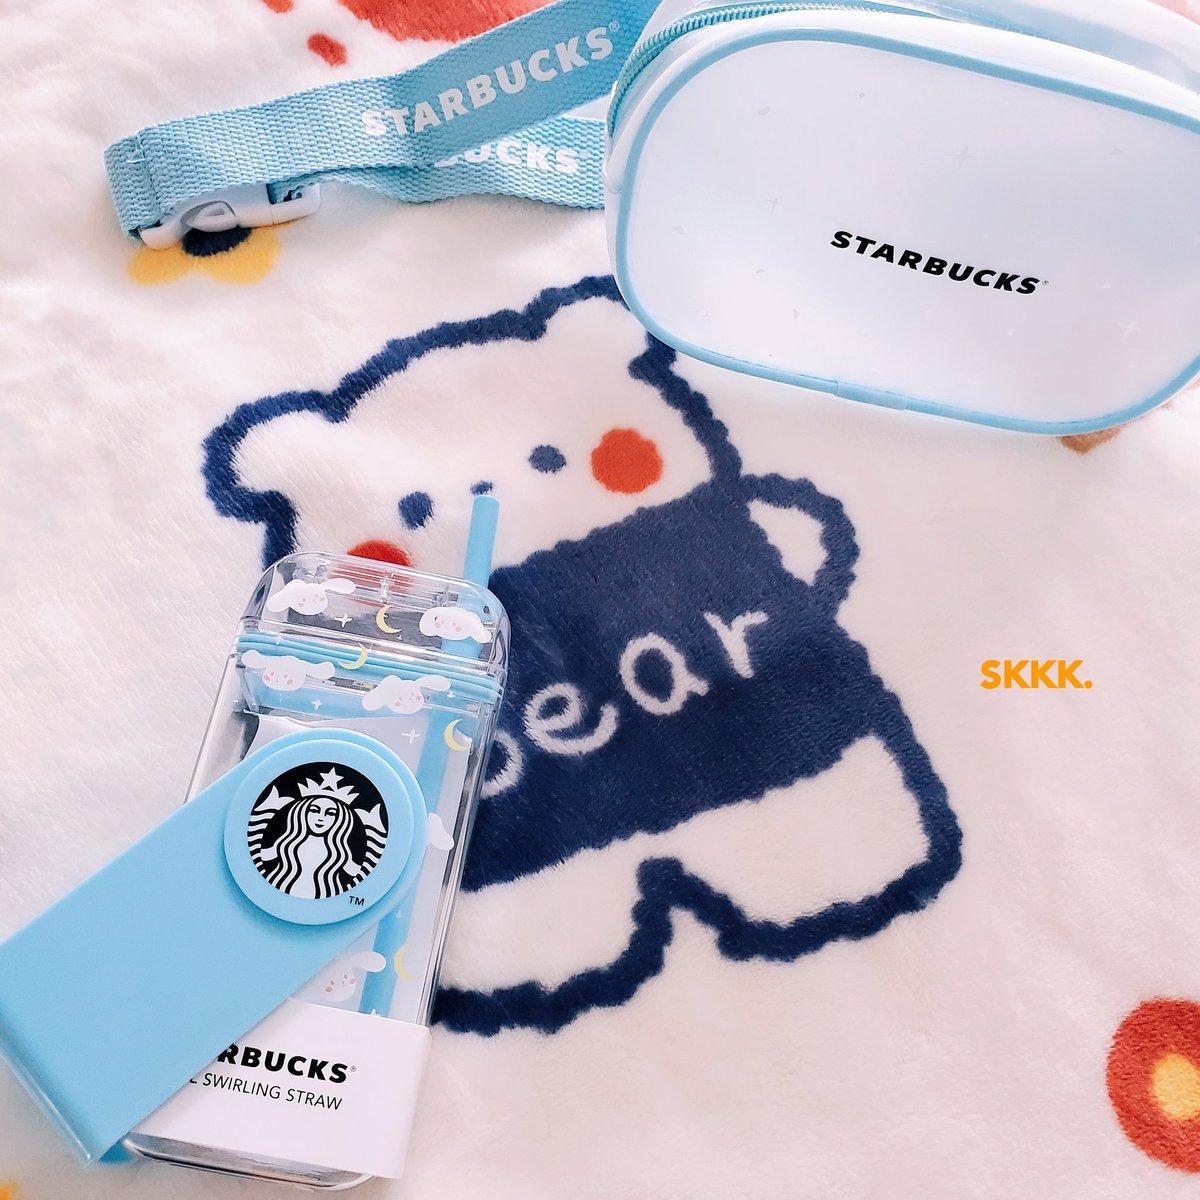 STARBUCKS 추석 한정 상품.🎁 절대 수지가 맞아! 완전 귀여워~ 백팩으로 바로 외출할 수 있어! 나는 전람회처럼 촬영했다. ㅋㅋㅋㅋㅋㅋㅋㅋㅋ... #Starbucks  #POPMART #ZIMOMO https://t.co/qHTZZVZsu4